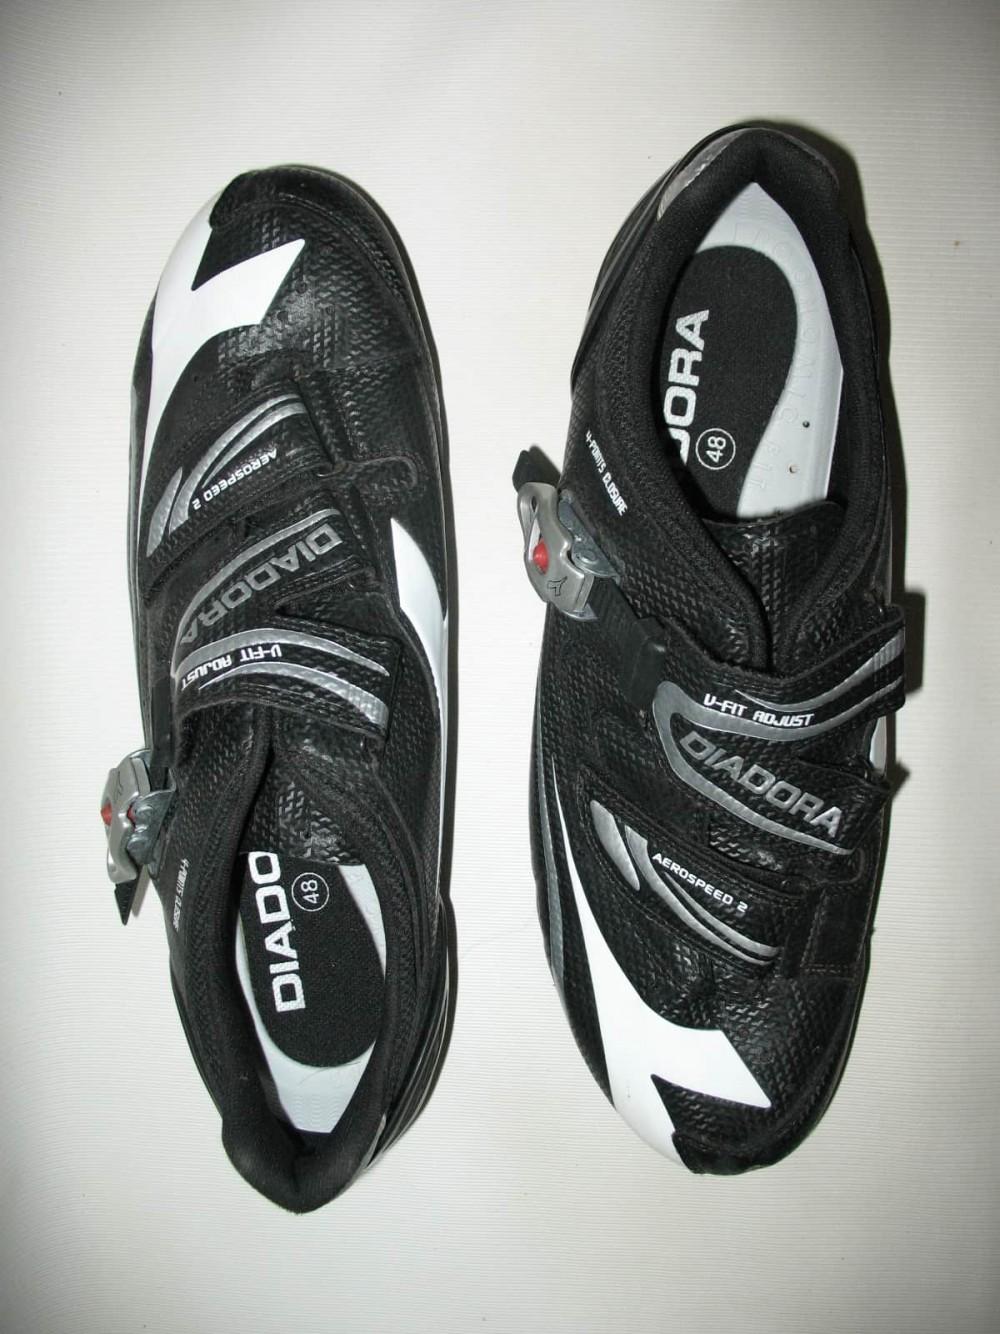 Велотуфли DIADORA aerospeed 2 road shoes (размер US13.5/UK13/EU48(на стопу 305 mm)) - 7